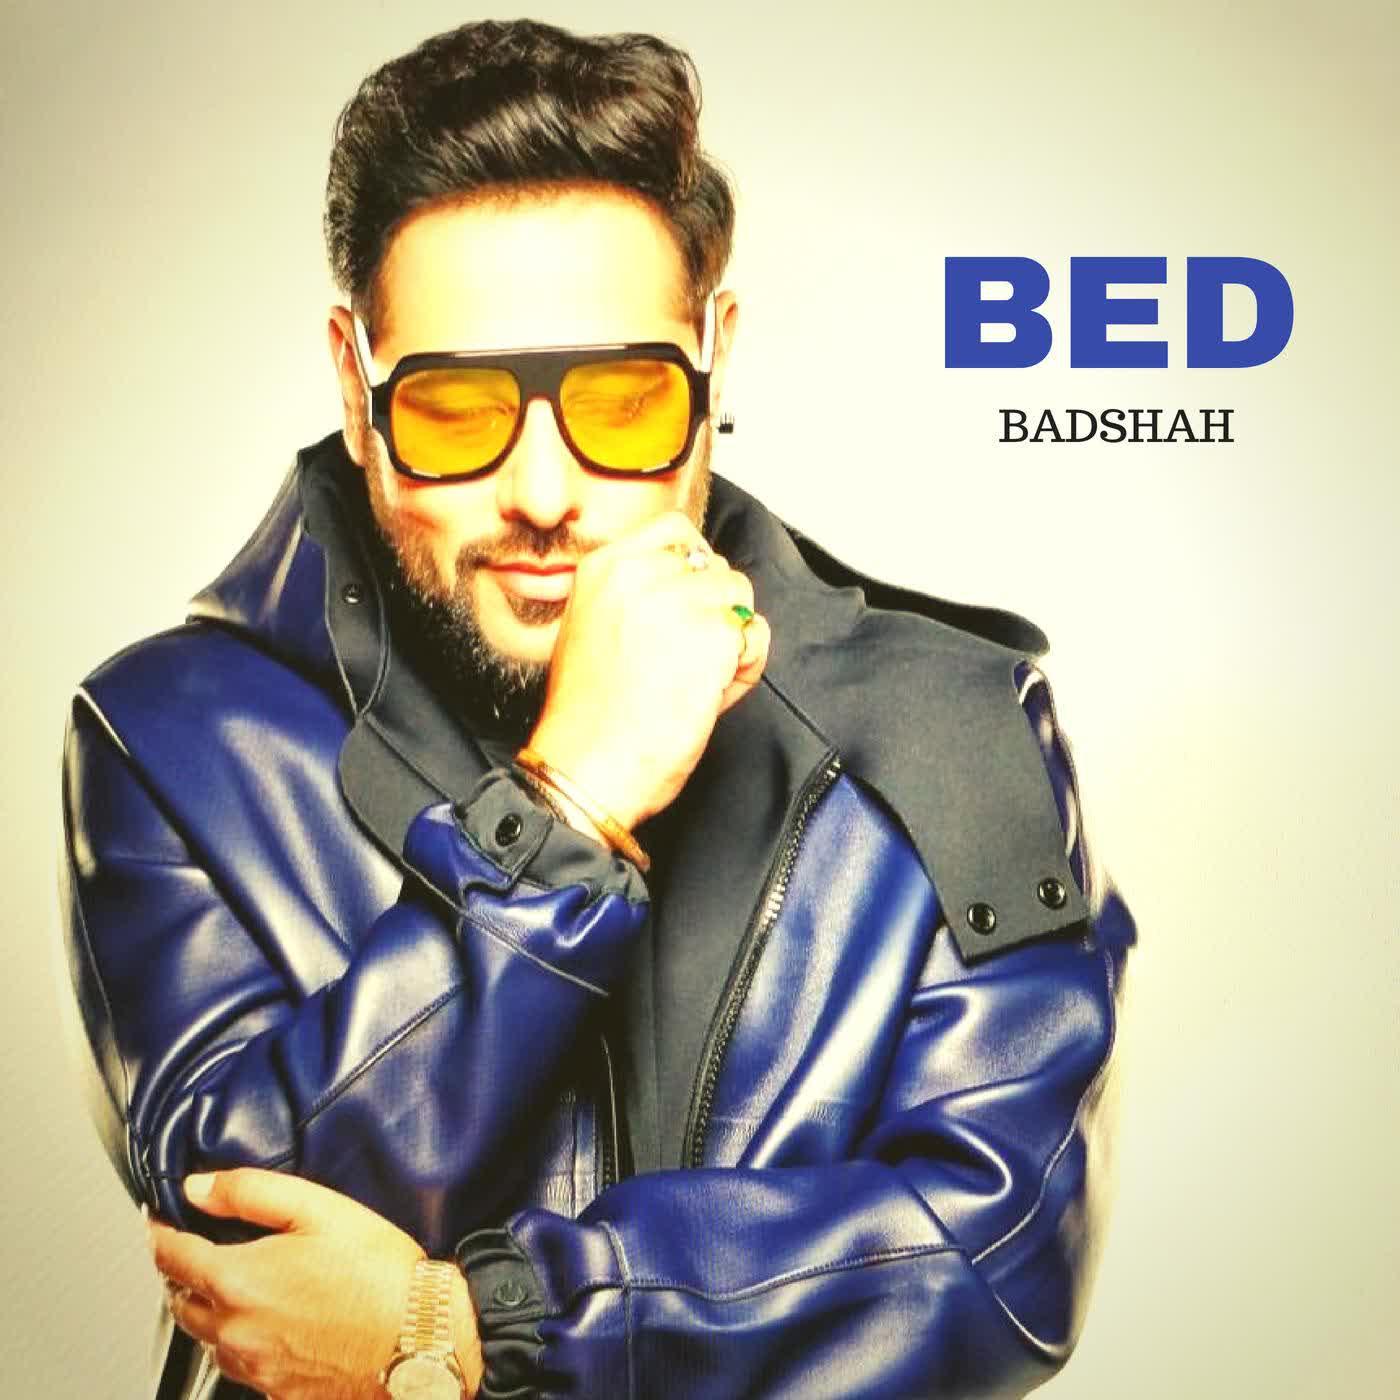 Bed Badshah